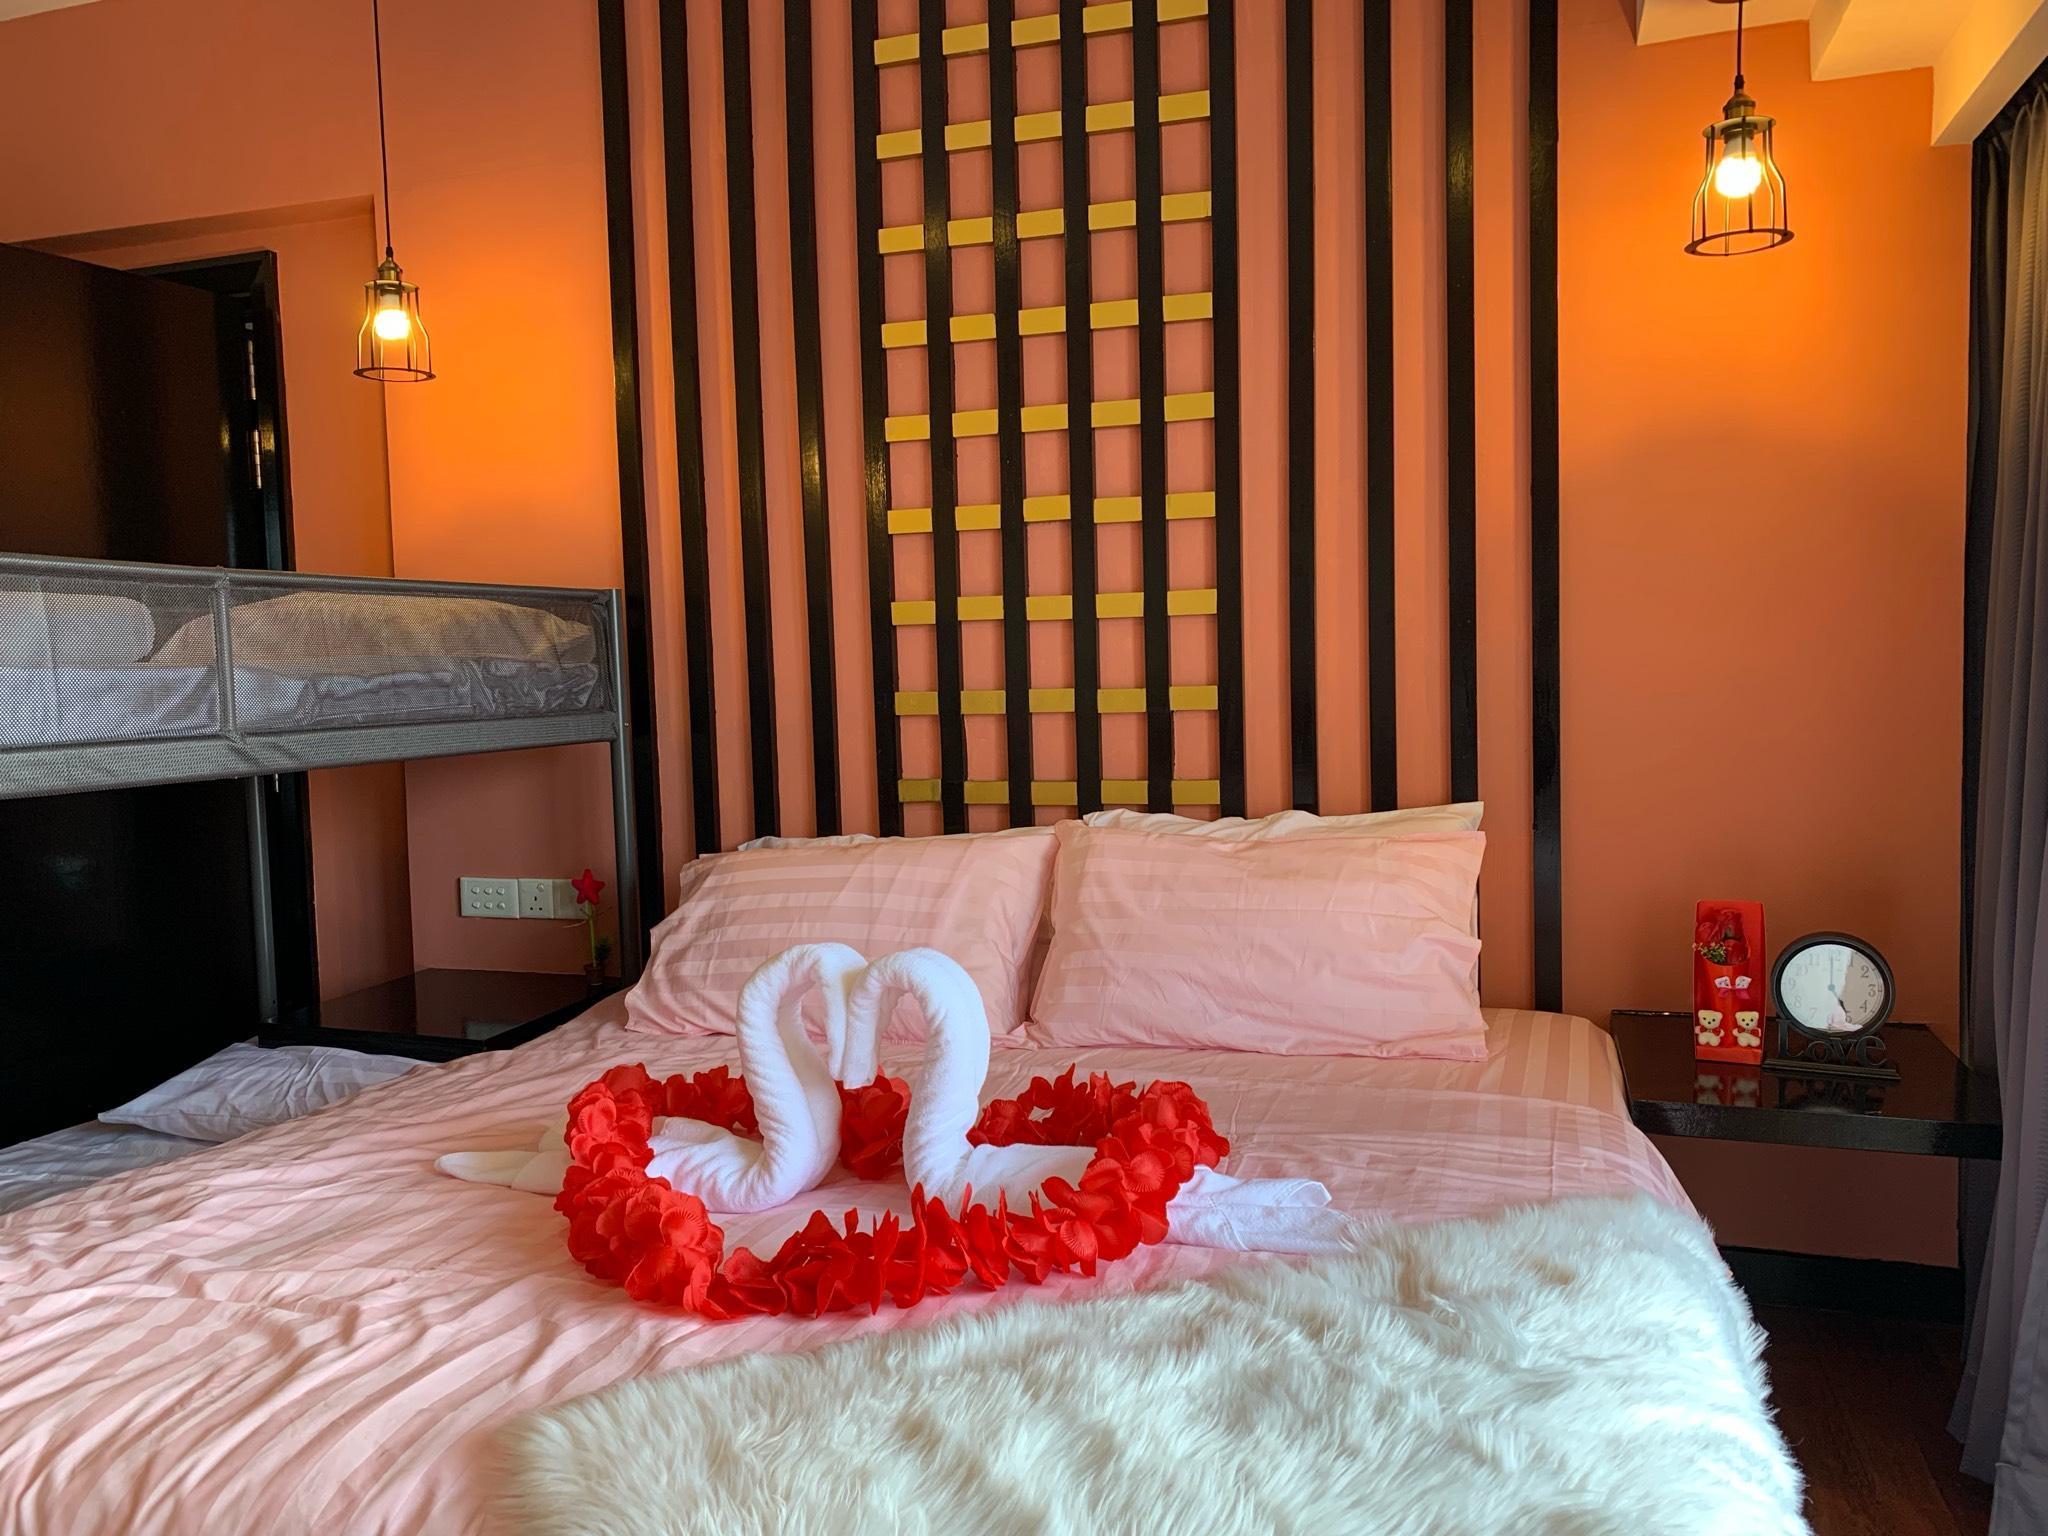 Luxurious Resort Suites Connected SunwayPyramid05